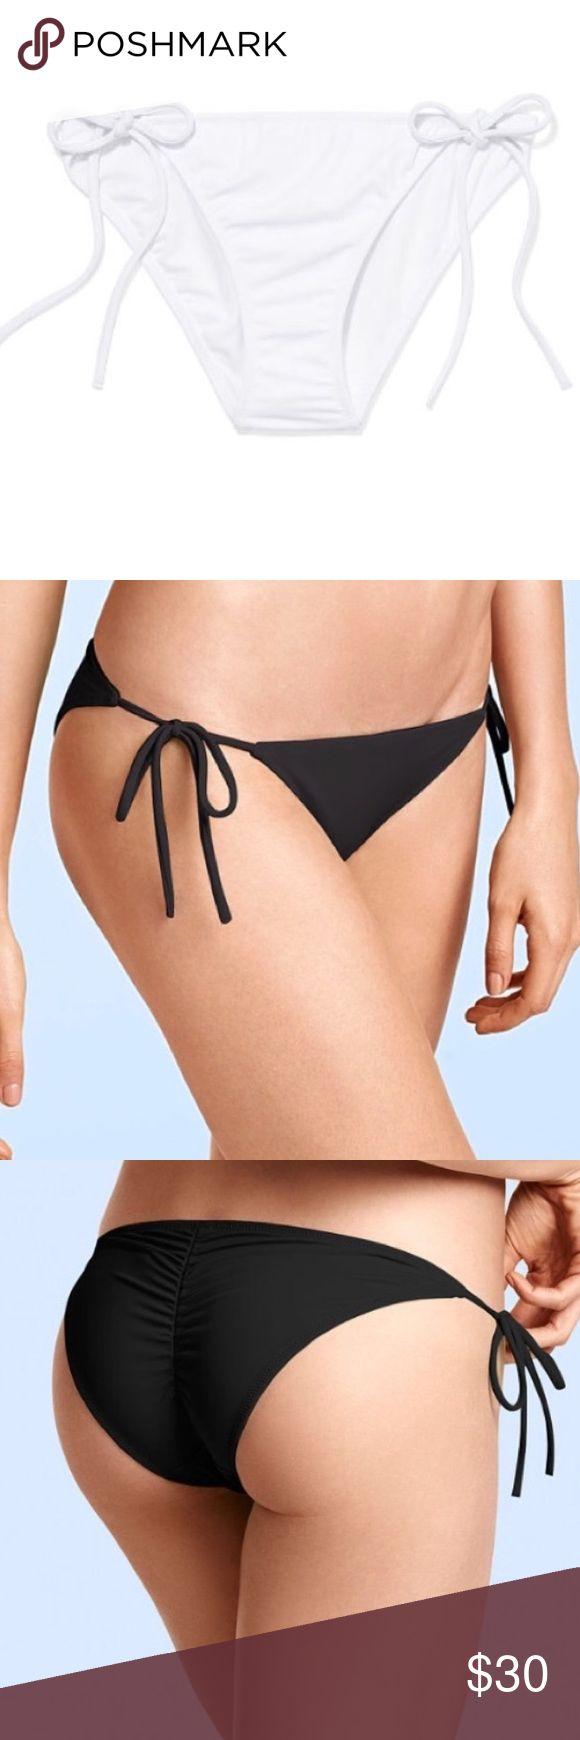 NEW Victoria's Secret the teeny bikini bottom New with tags in packaging. Victoria's Secret the teeny bikini bottom in white. Modeled in black. Tie sides. Scrunch bottom. Size large. Victoria's Secret Swim Bikinis